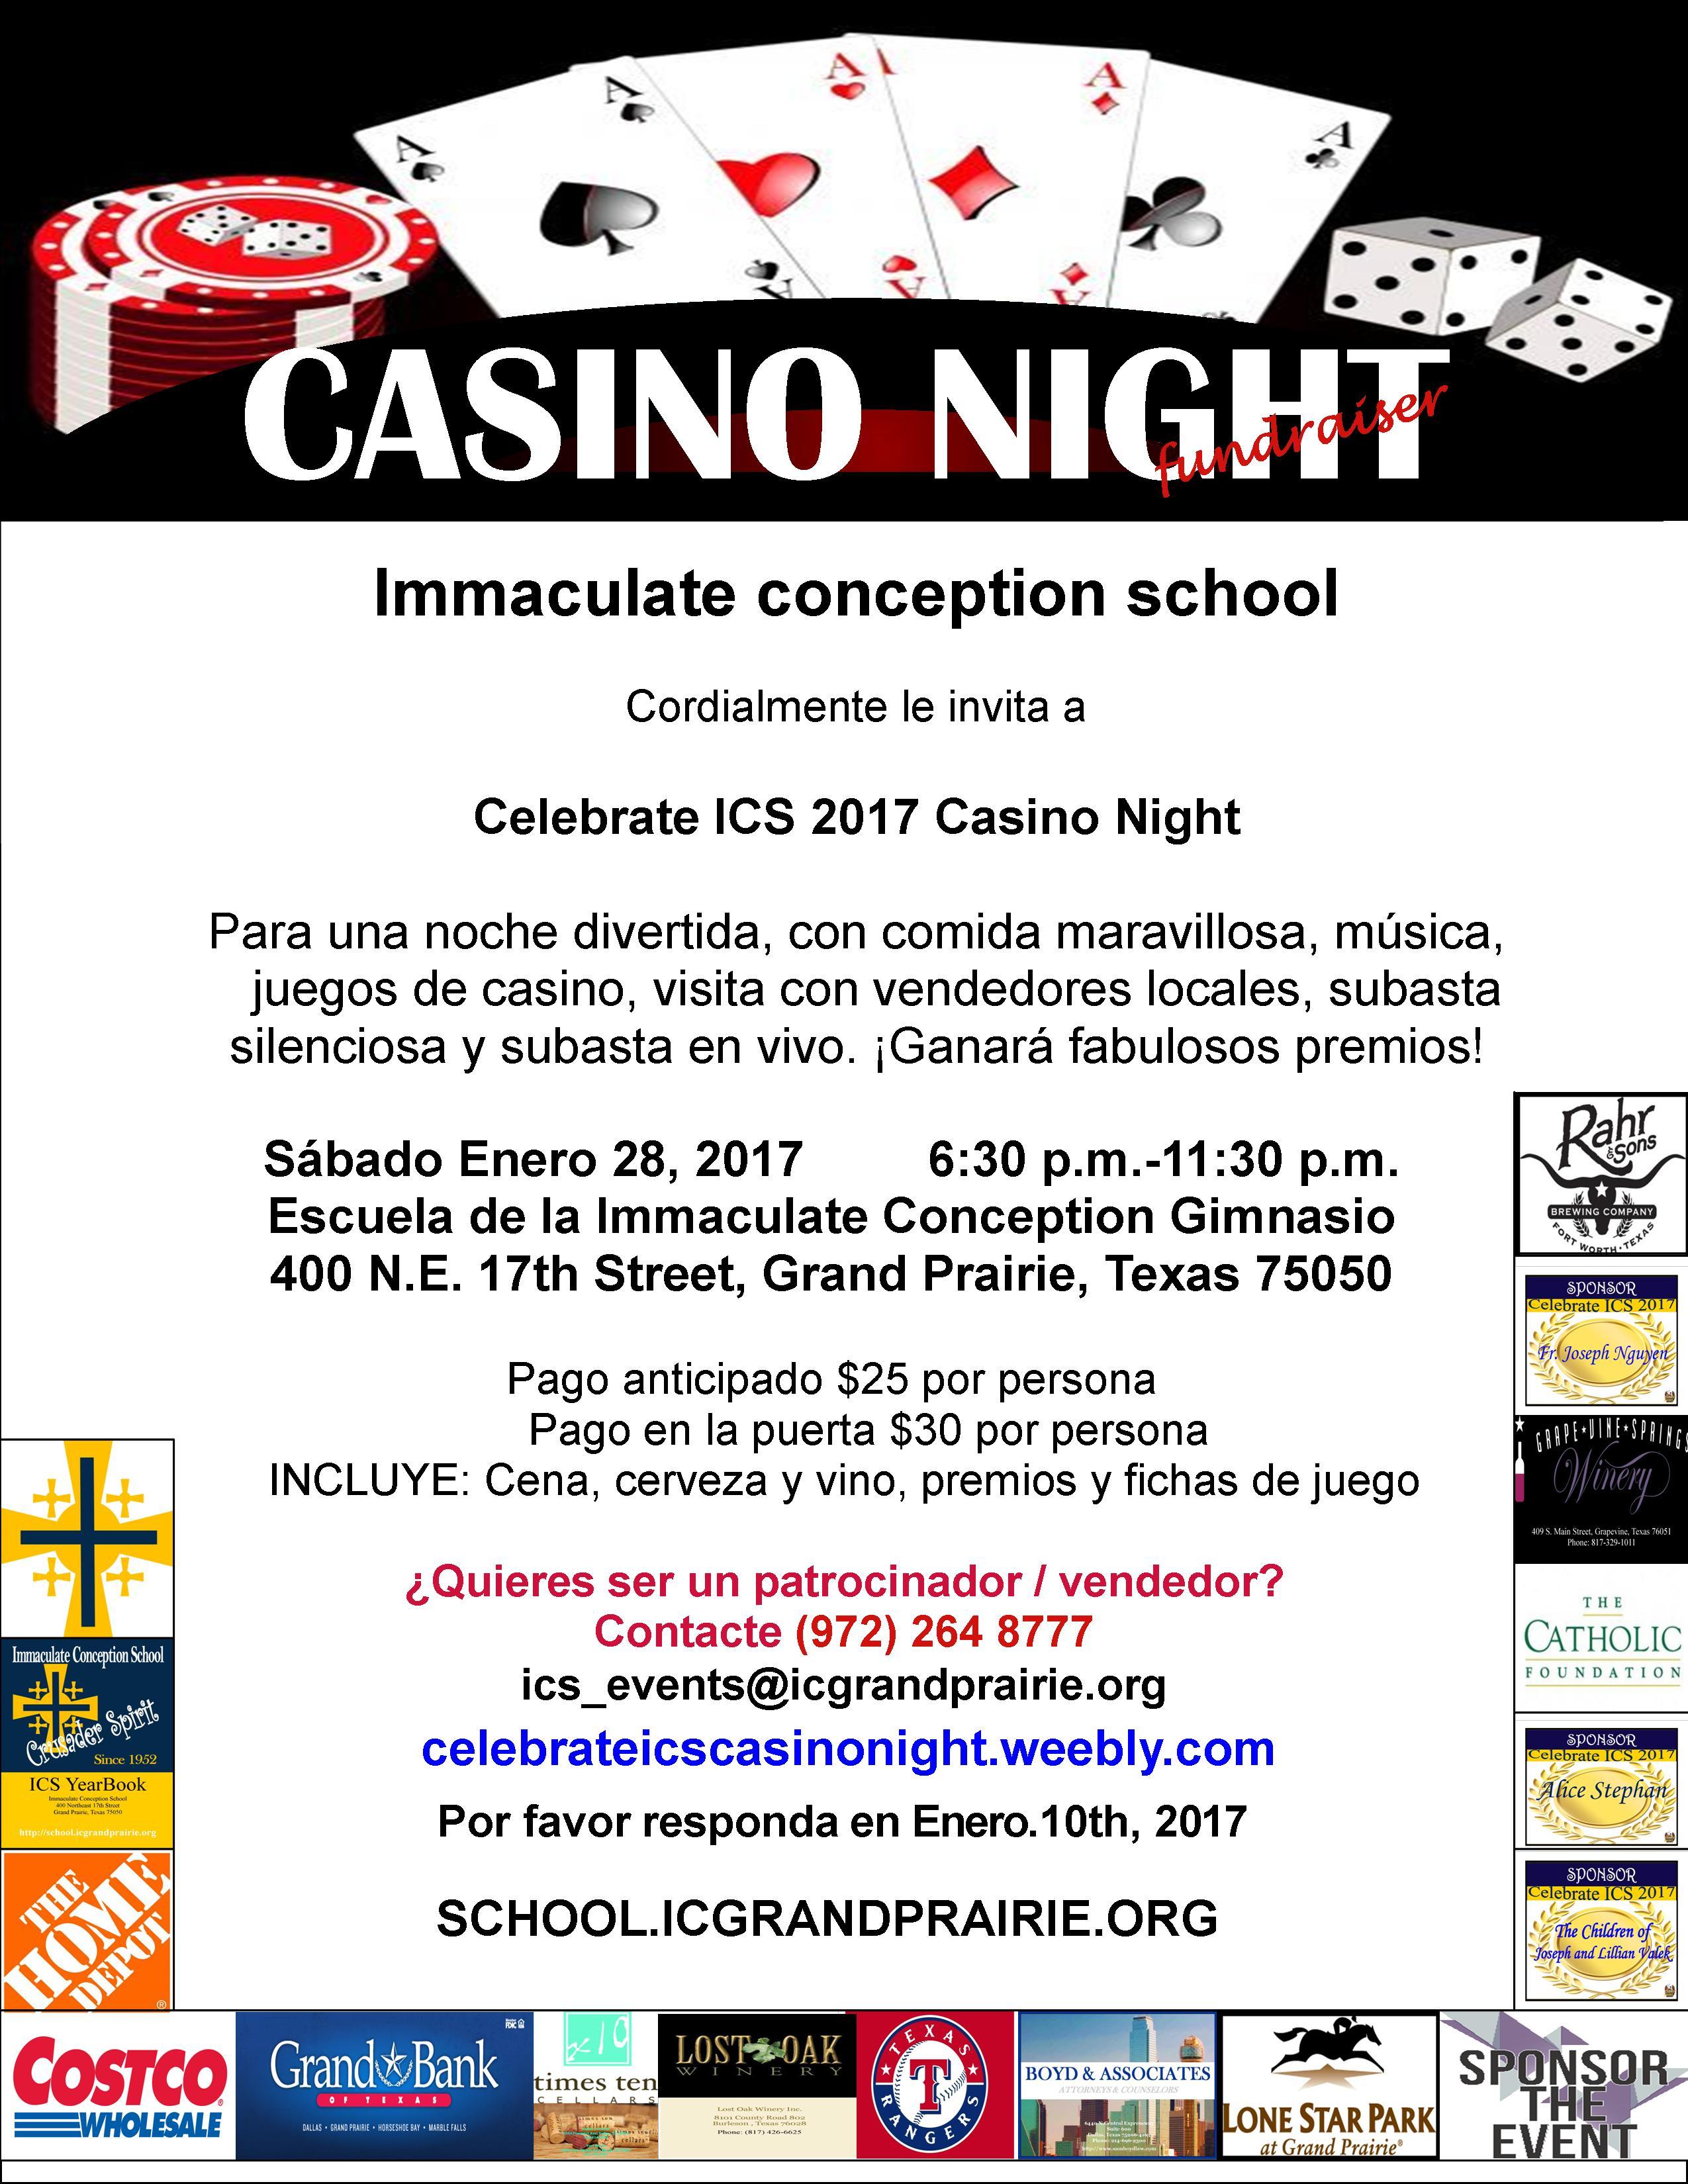 venga a disfrutar de los sabores de Grand Prairie Casino Night 2017